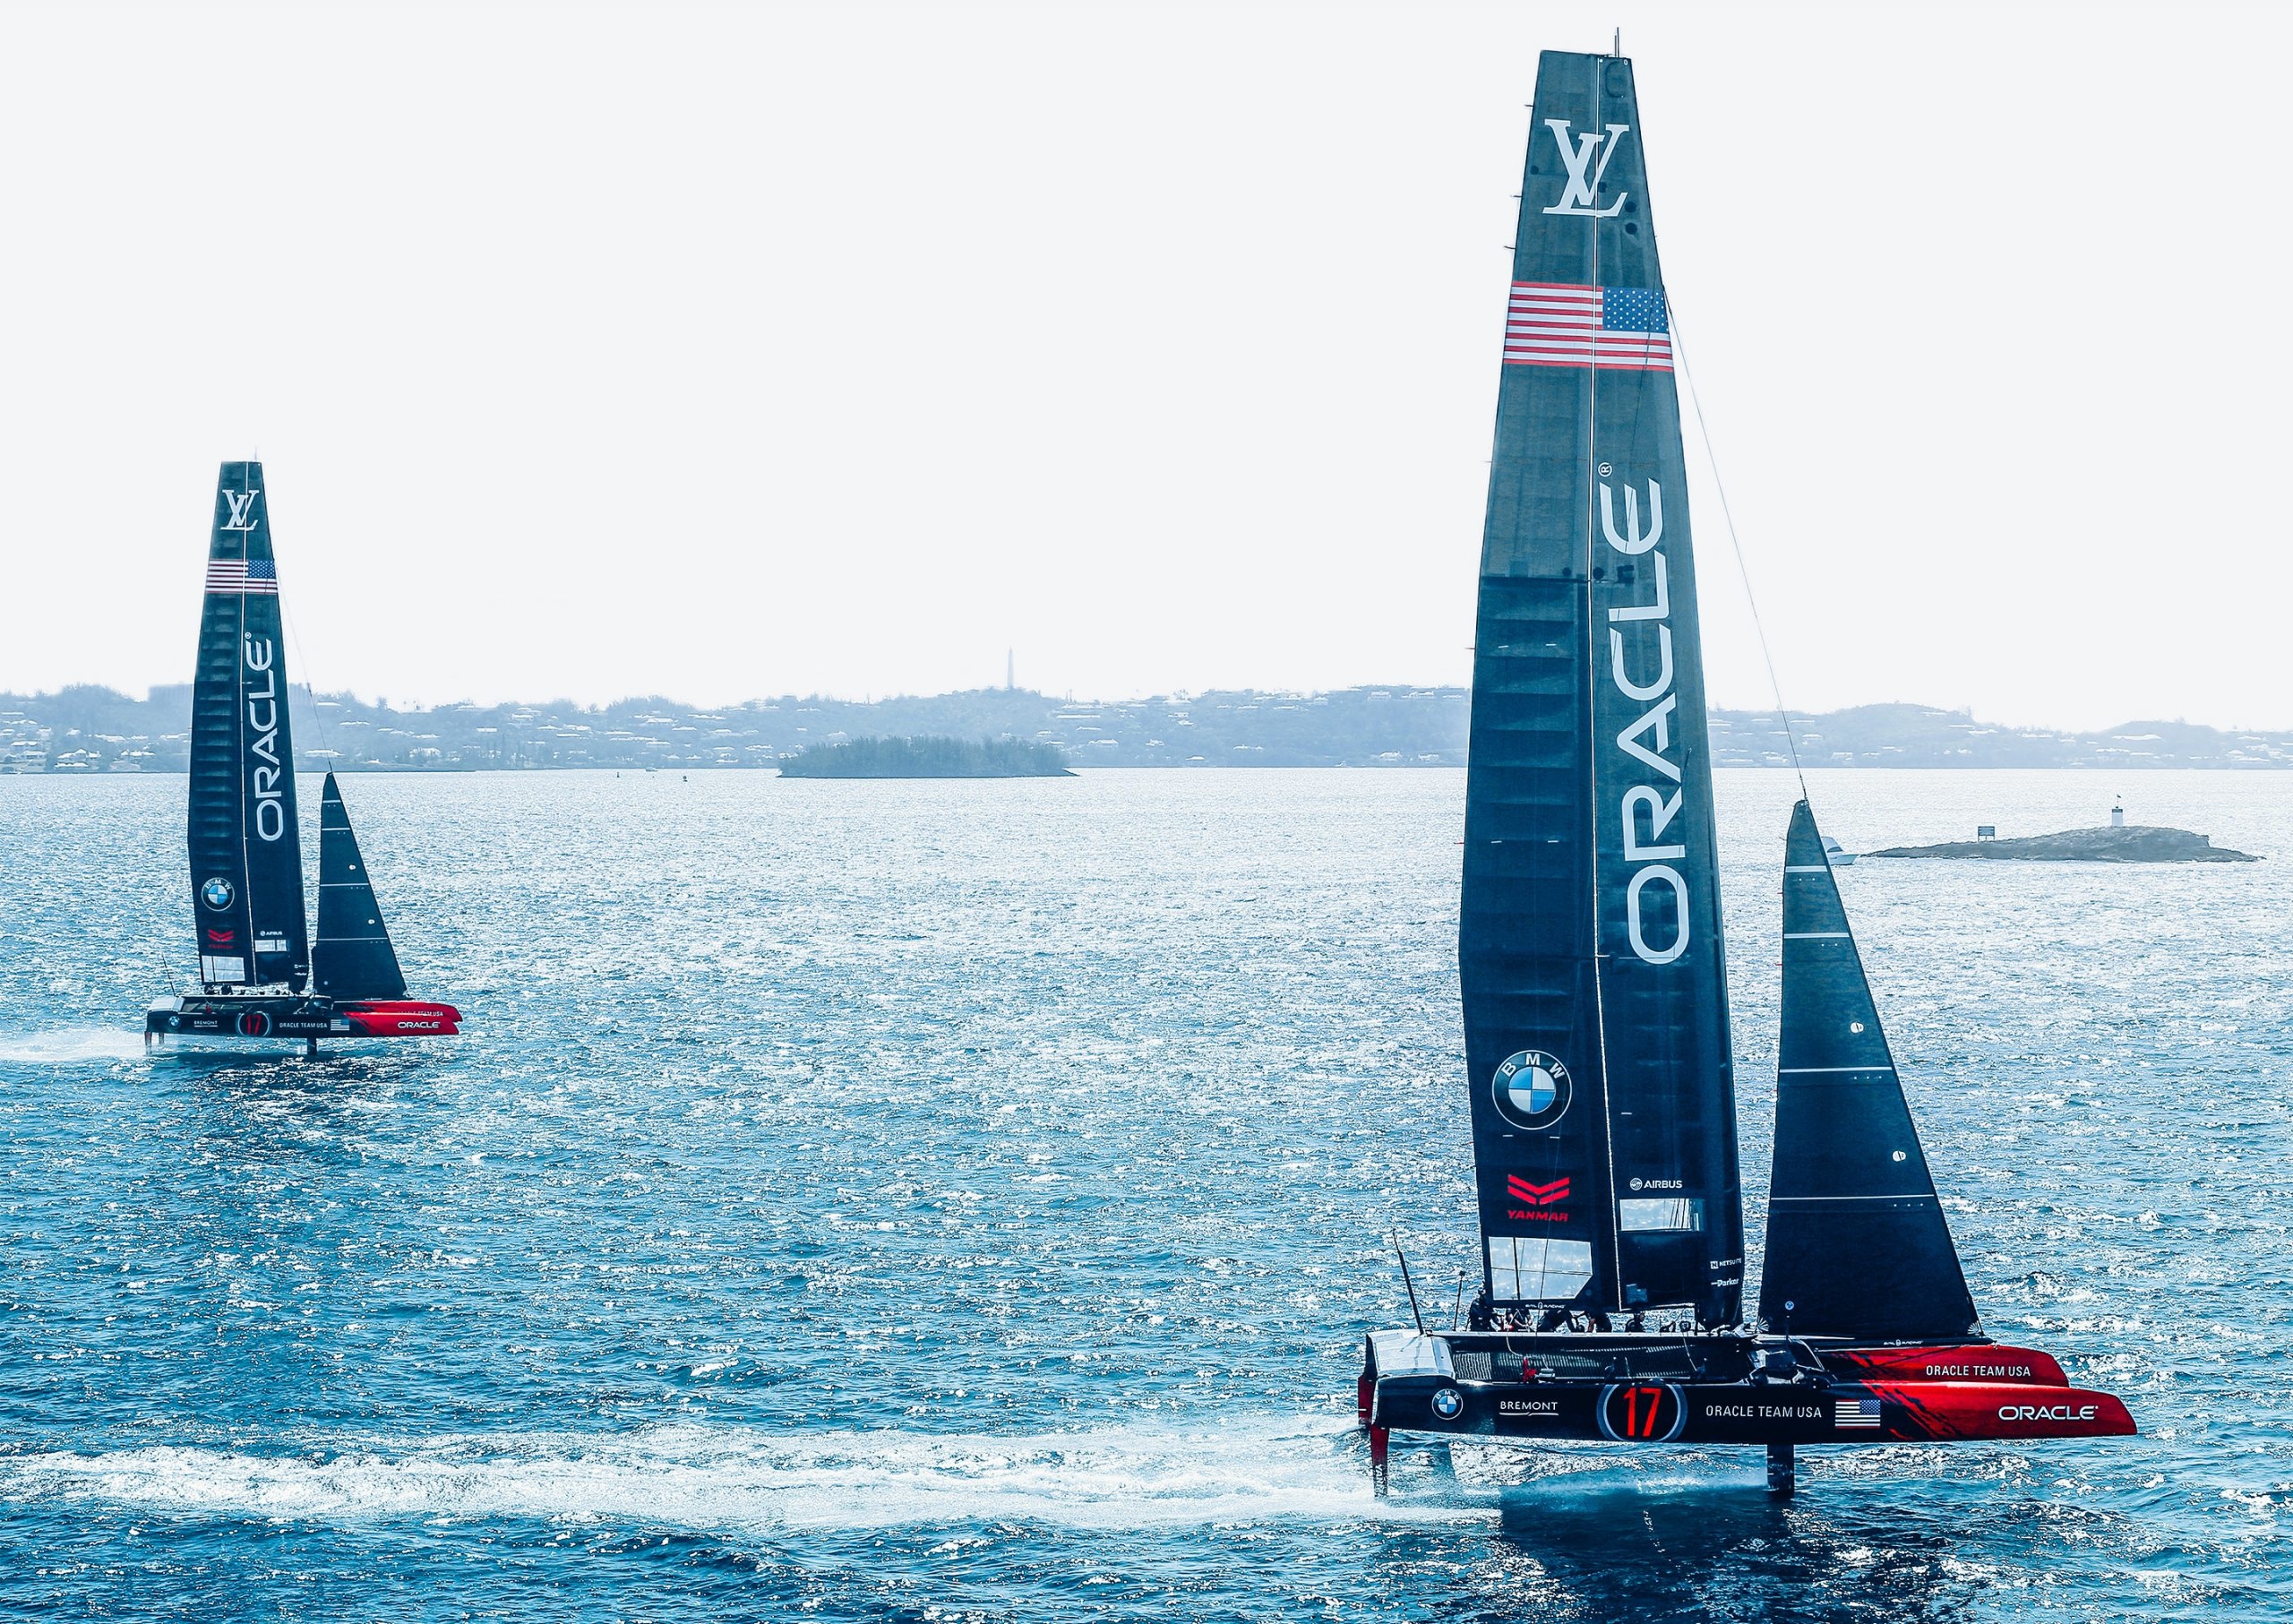 pascher-heinz-bmw-yachtsport-digital-communication-footer-image